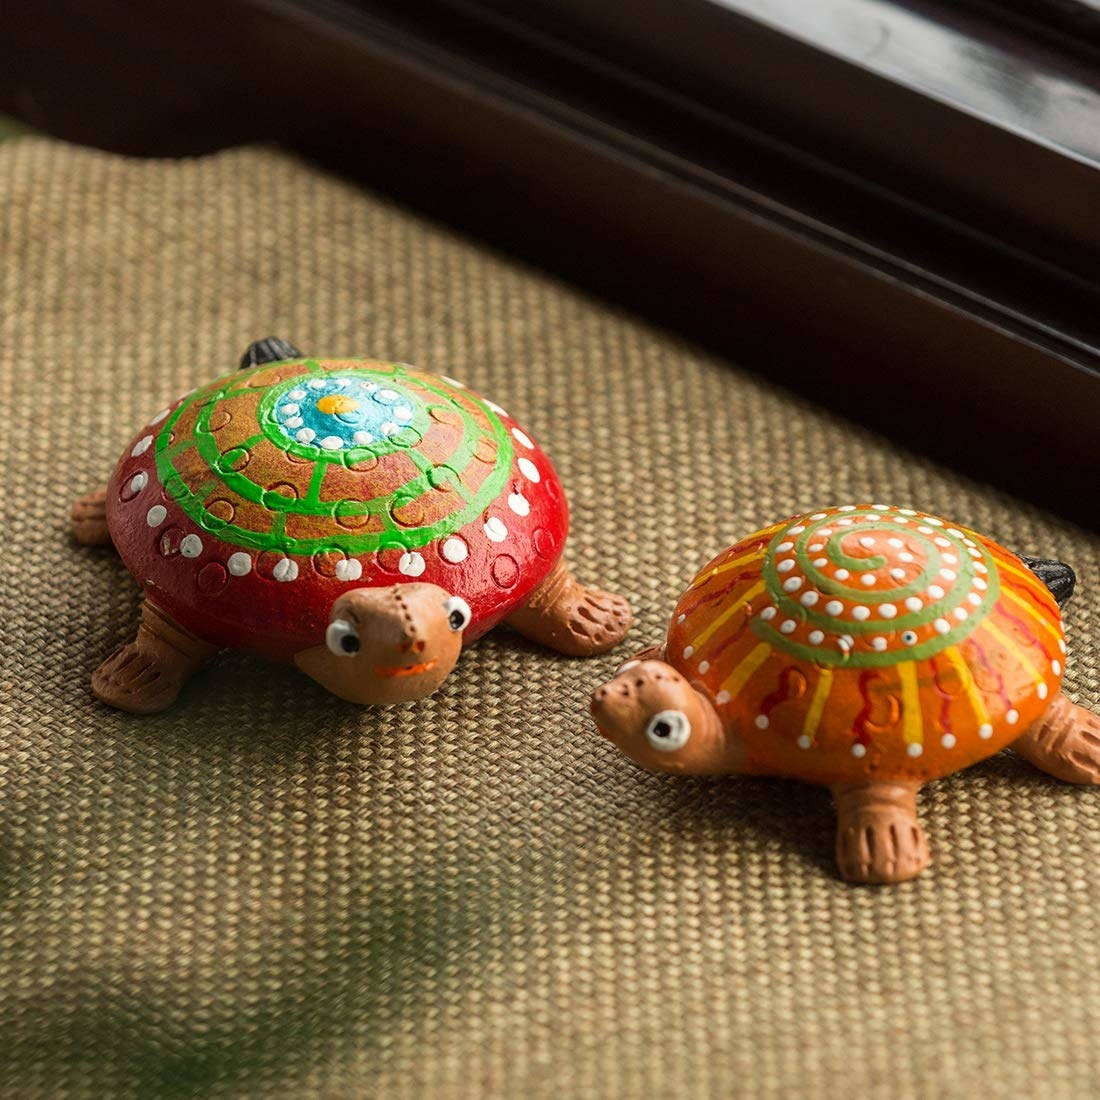 Terracotta turtles